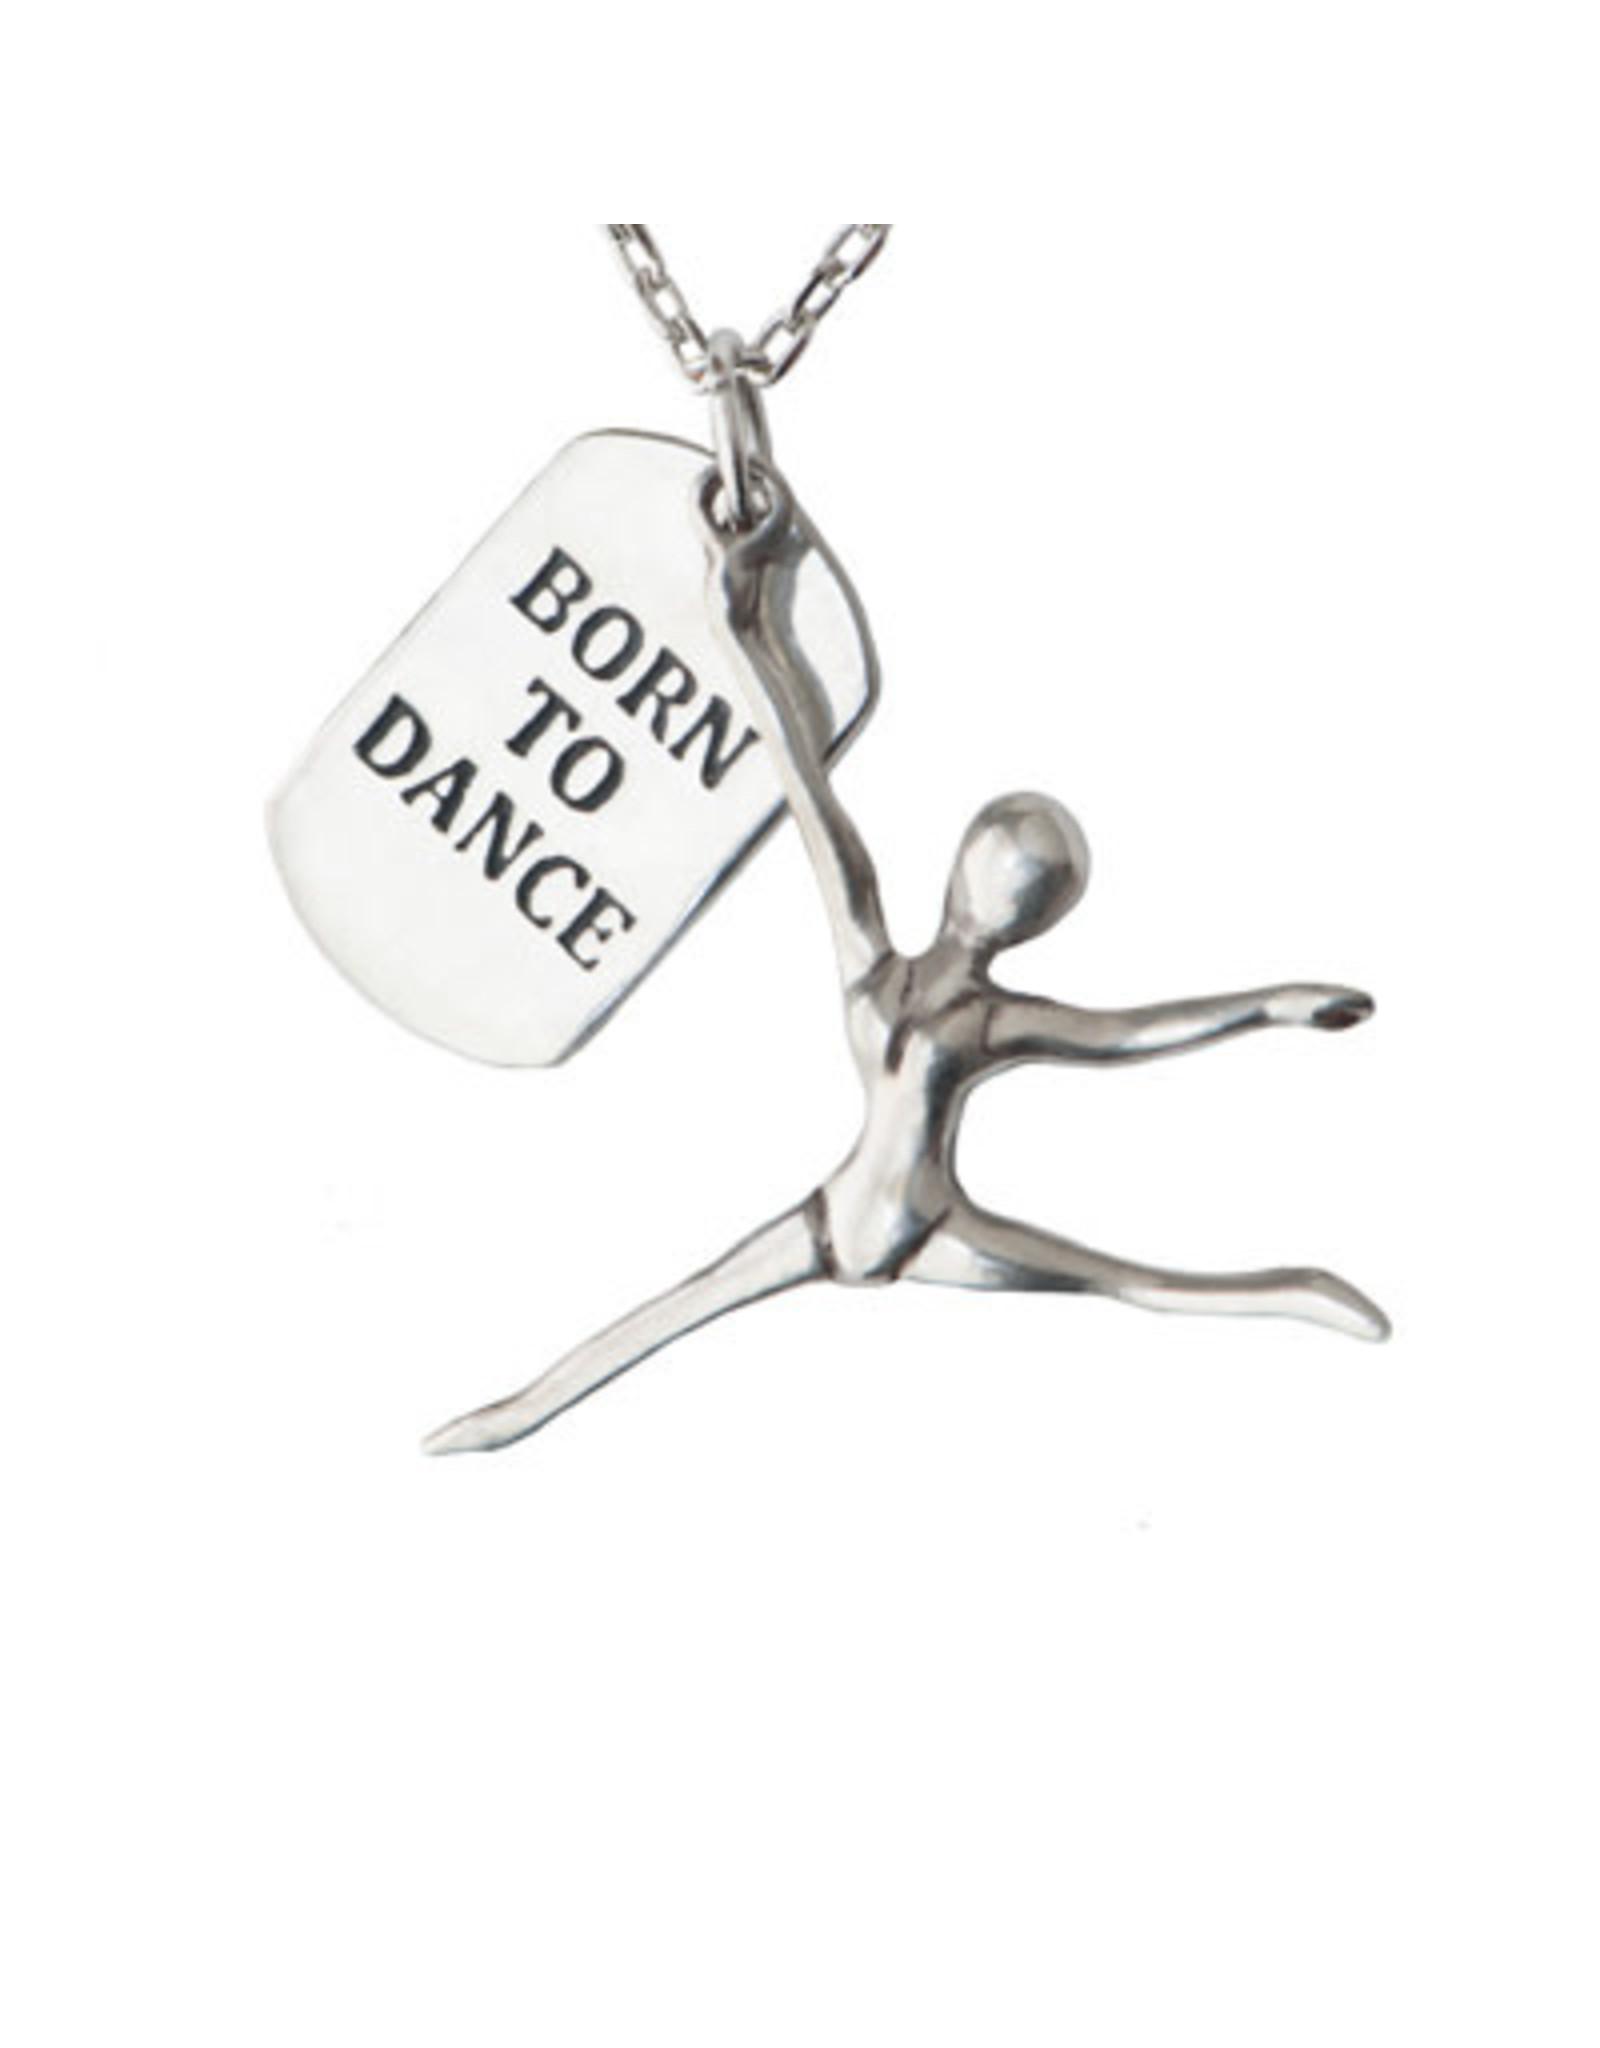 Pendant Necklace Born to Dance, Thailand